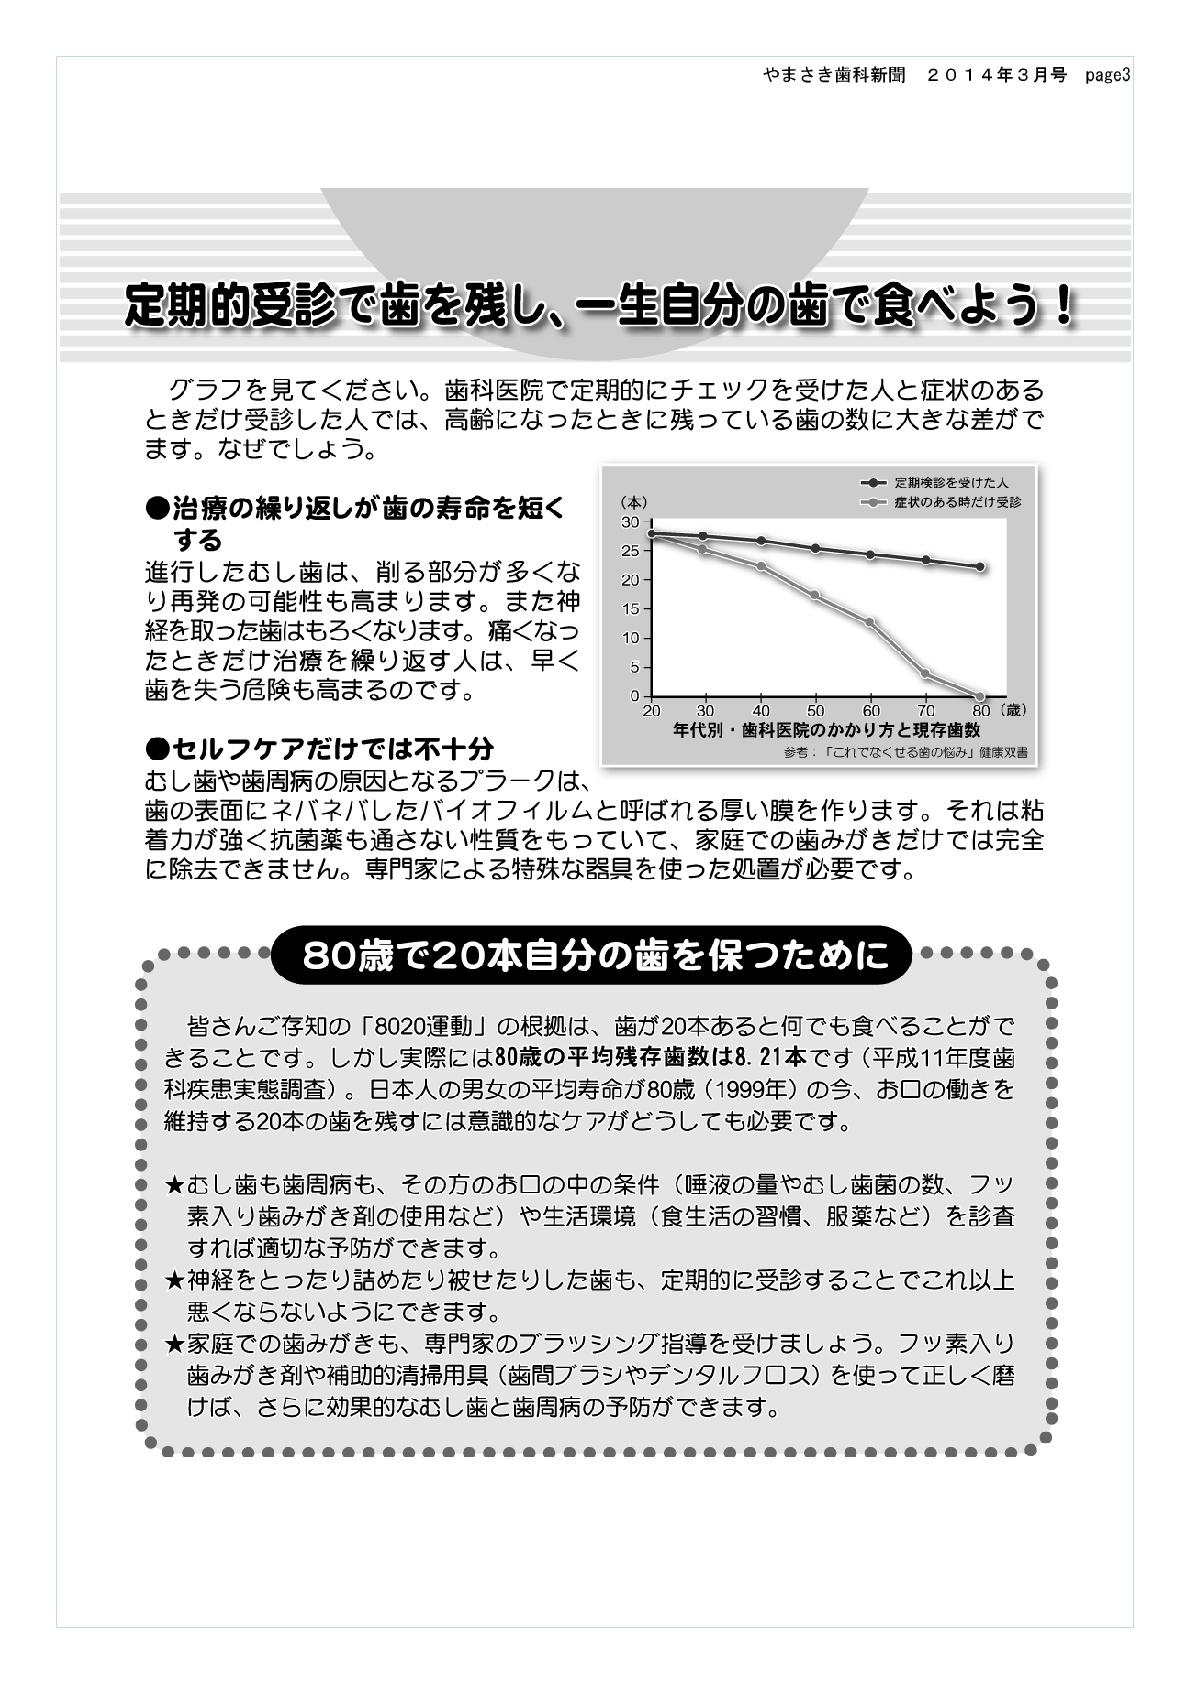 sinbun14-3-2-002